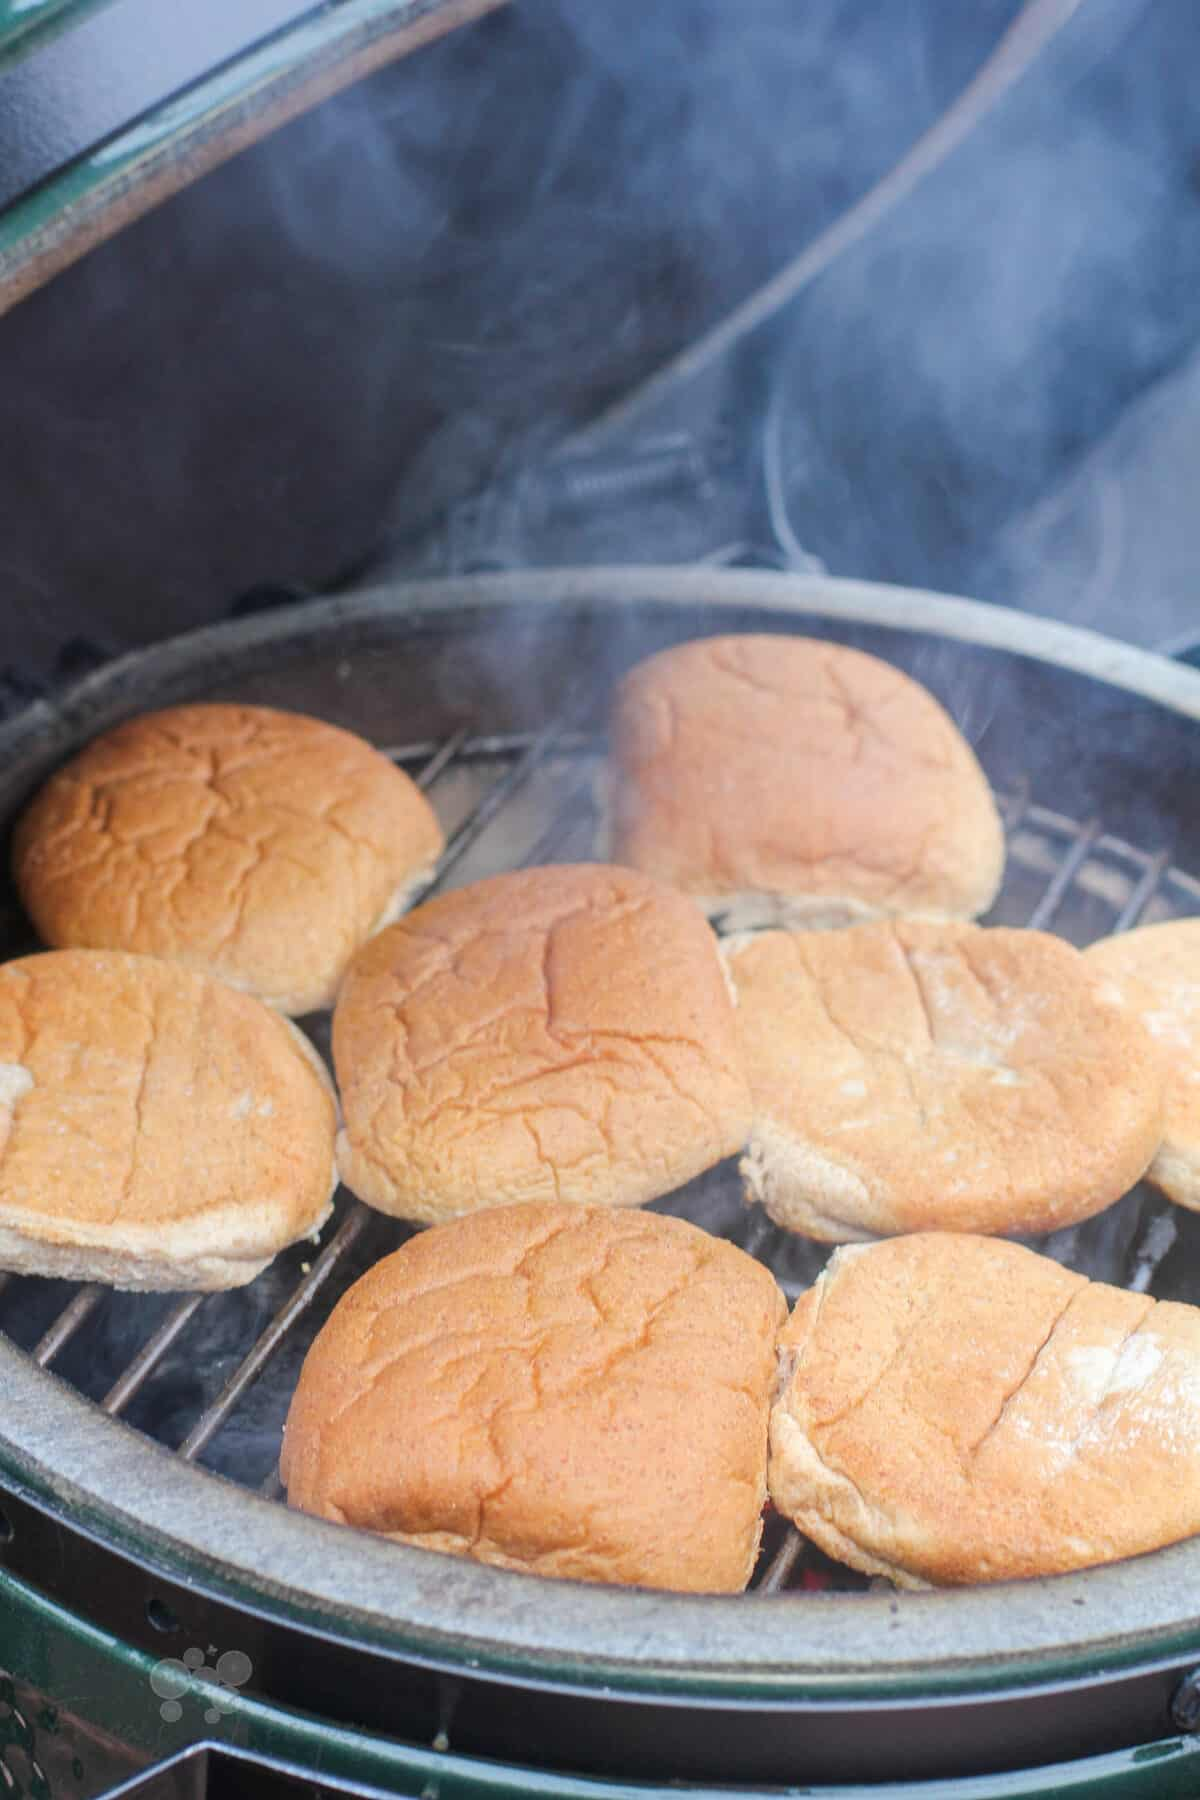 bins toasting on grill